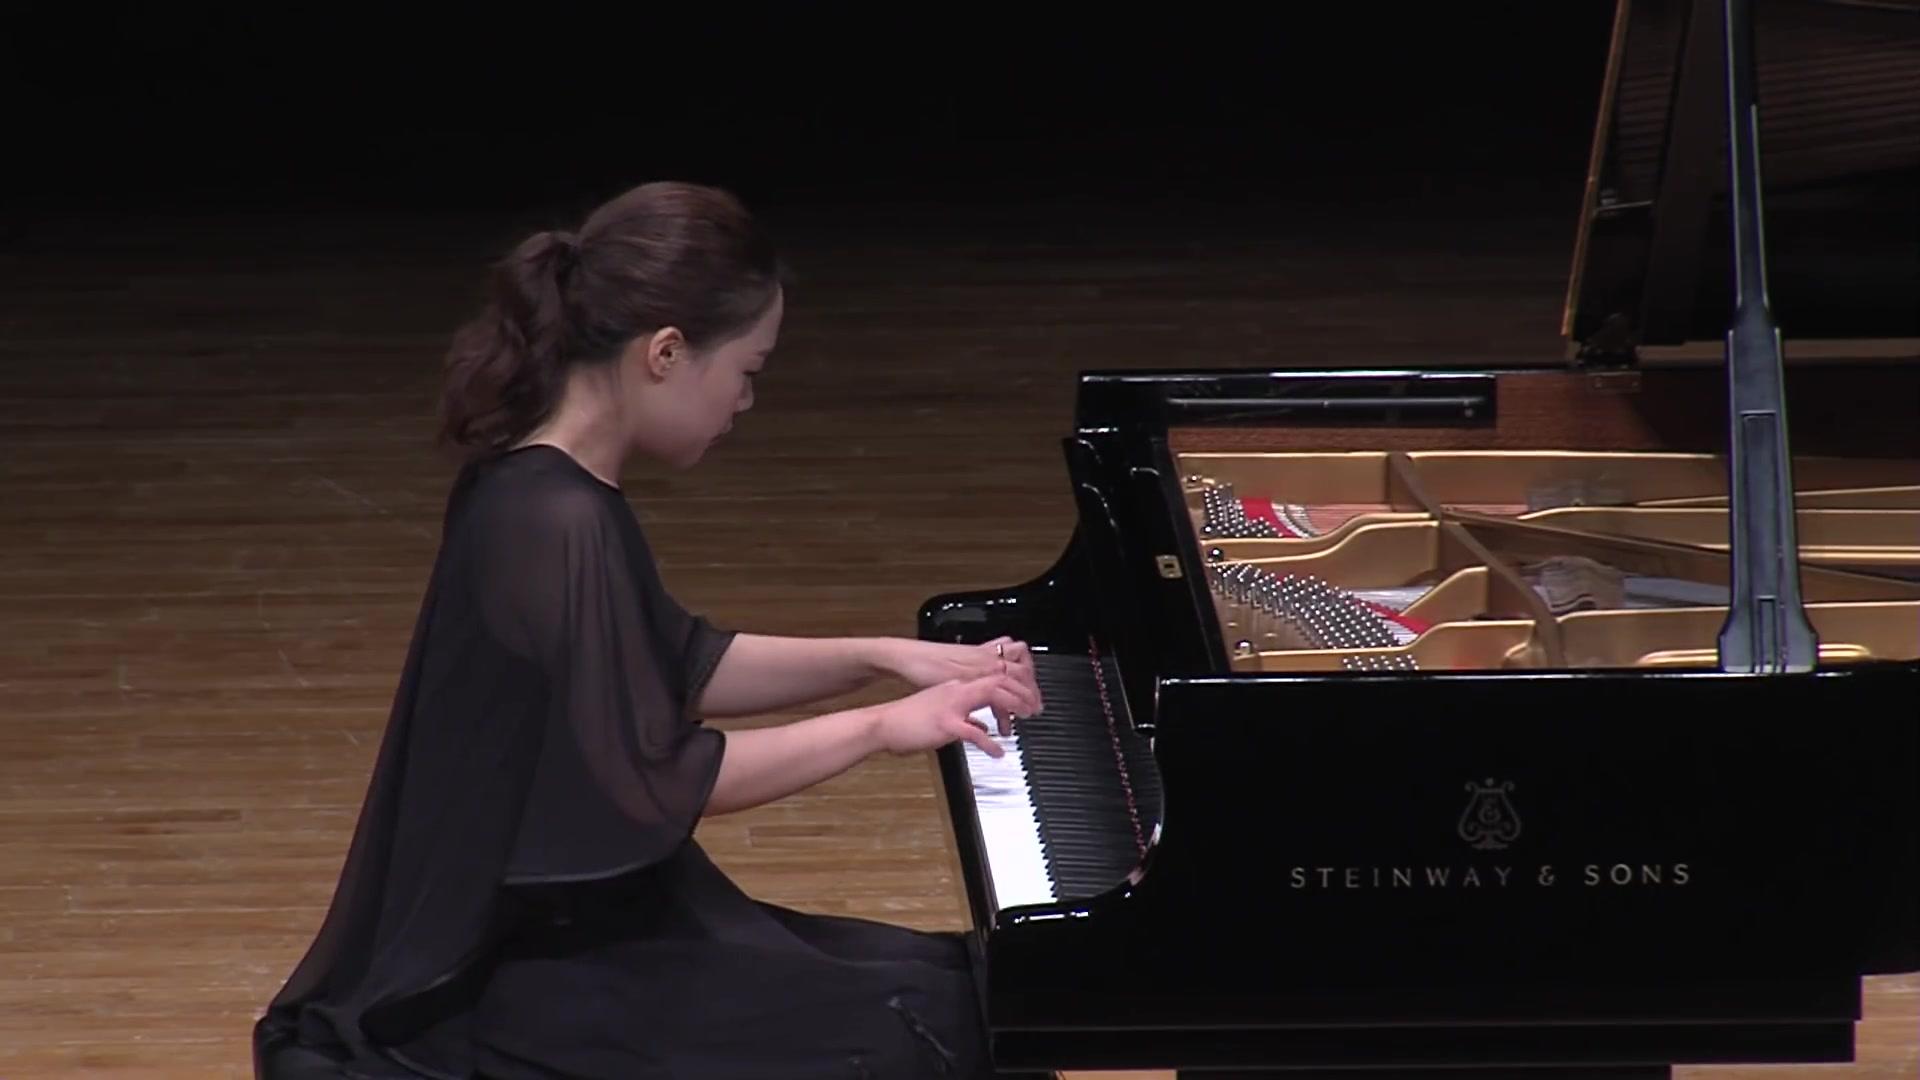 【YouTube搬运】Yeol Eum Son 演奏 Alkan: Le festin d'Esope, op.39 no.12 【宋悦云演奏阿尔坎伊索的晚宴】